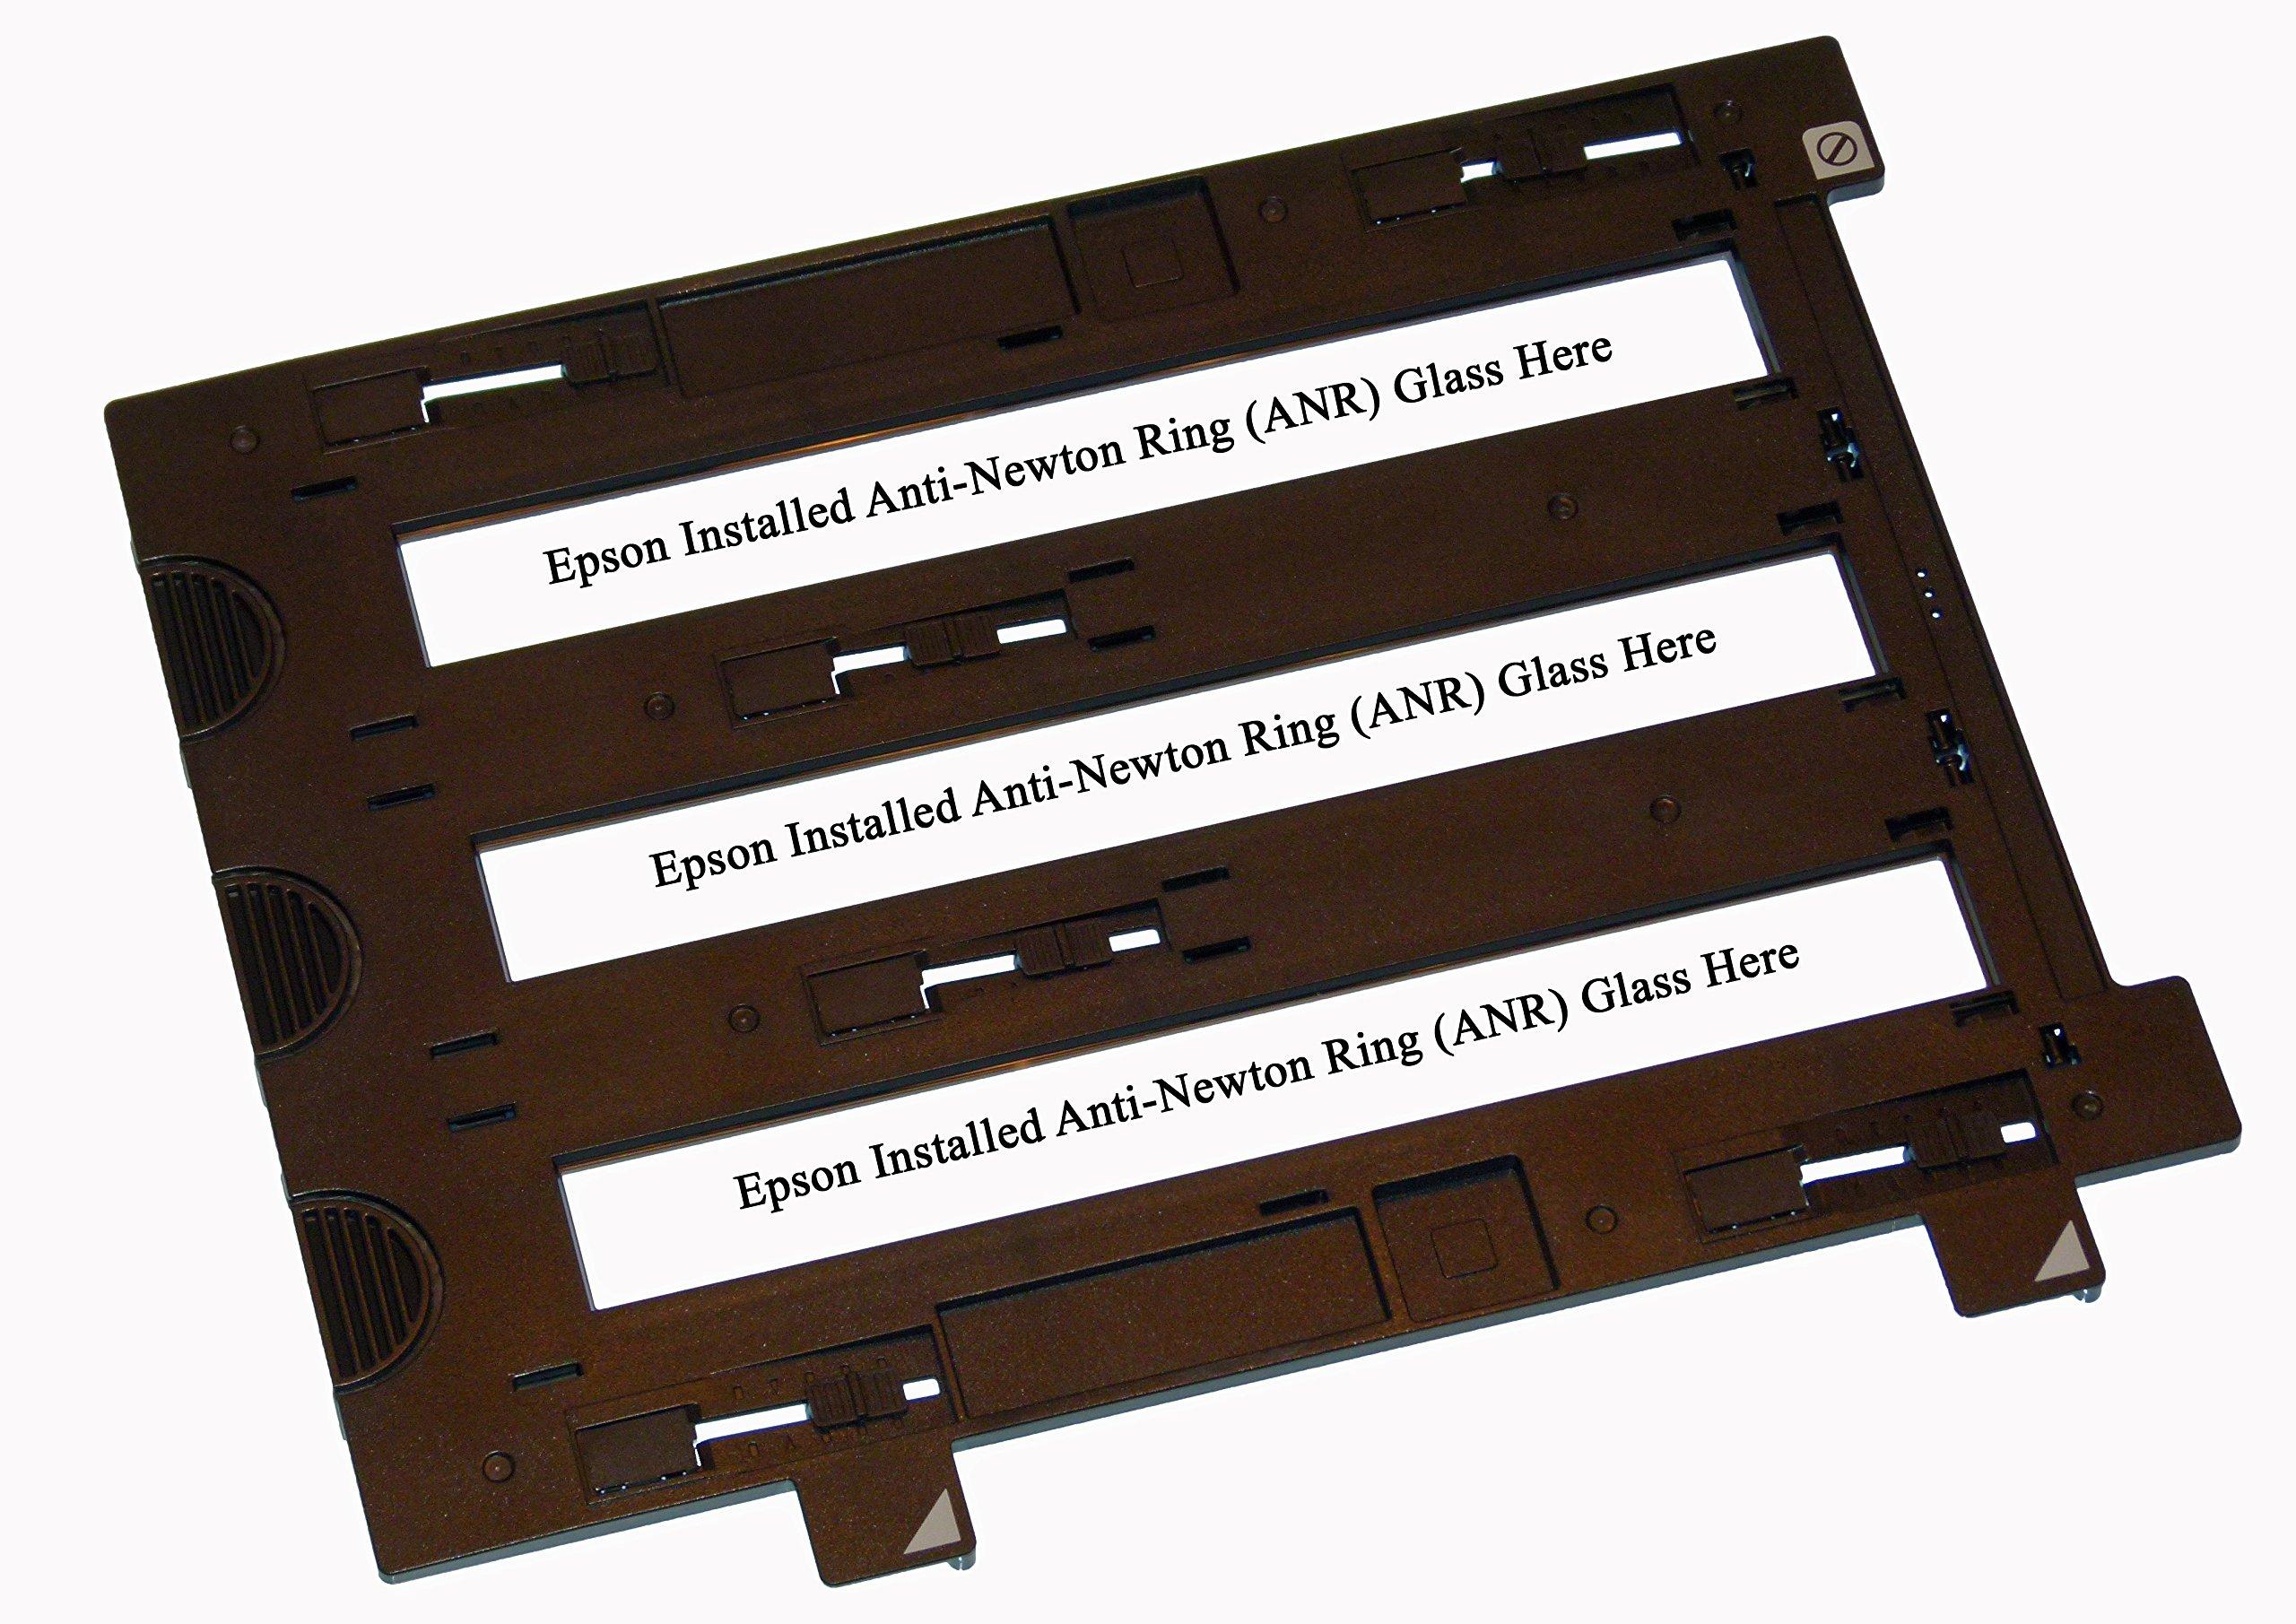 OEM Epson Scanner Film Holder with ANR for Epson Perfection V800 & V850-35mm Negative Filmstrip Holder by GenuineOEMEpson